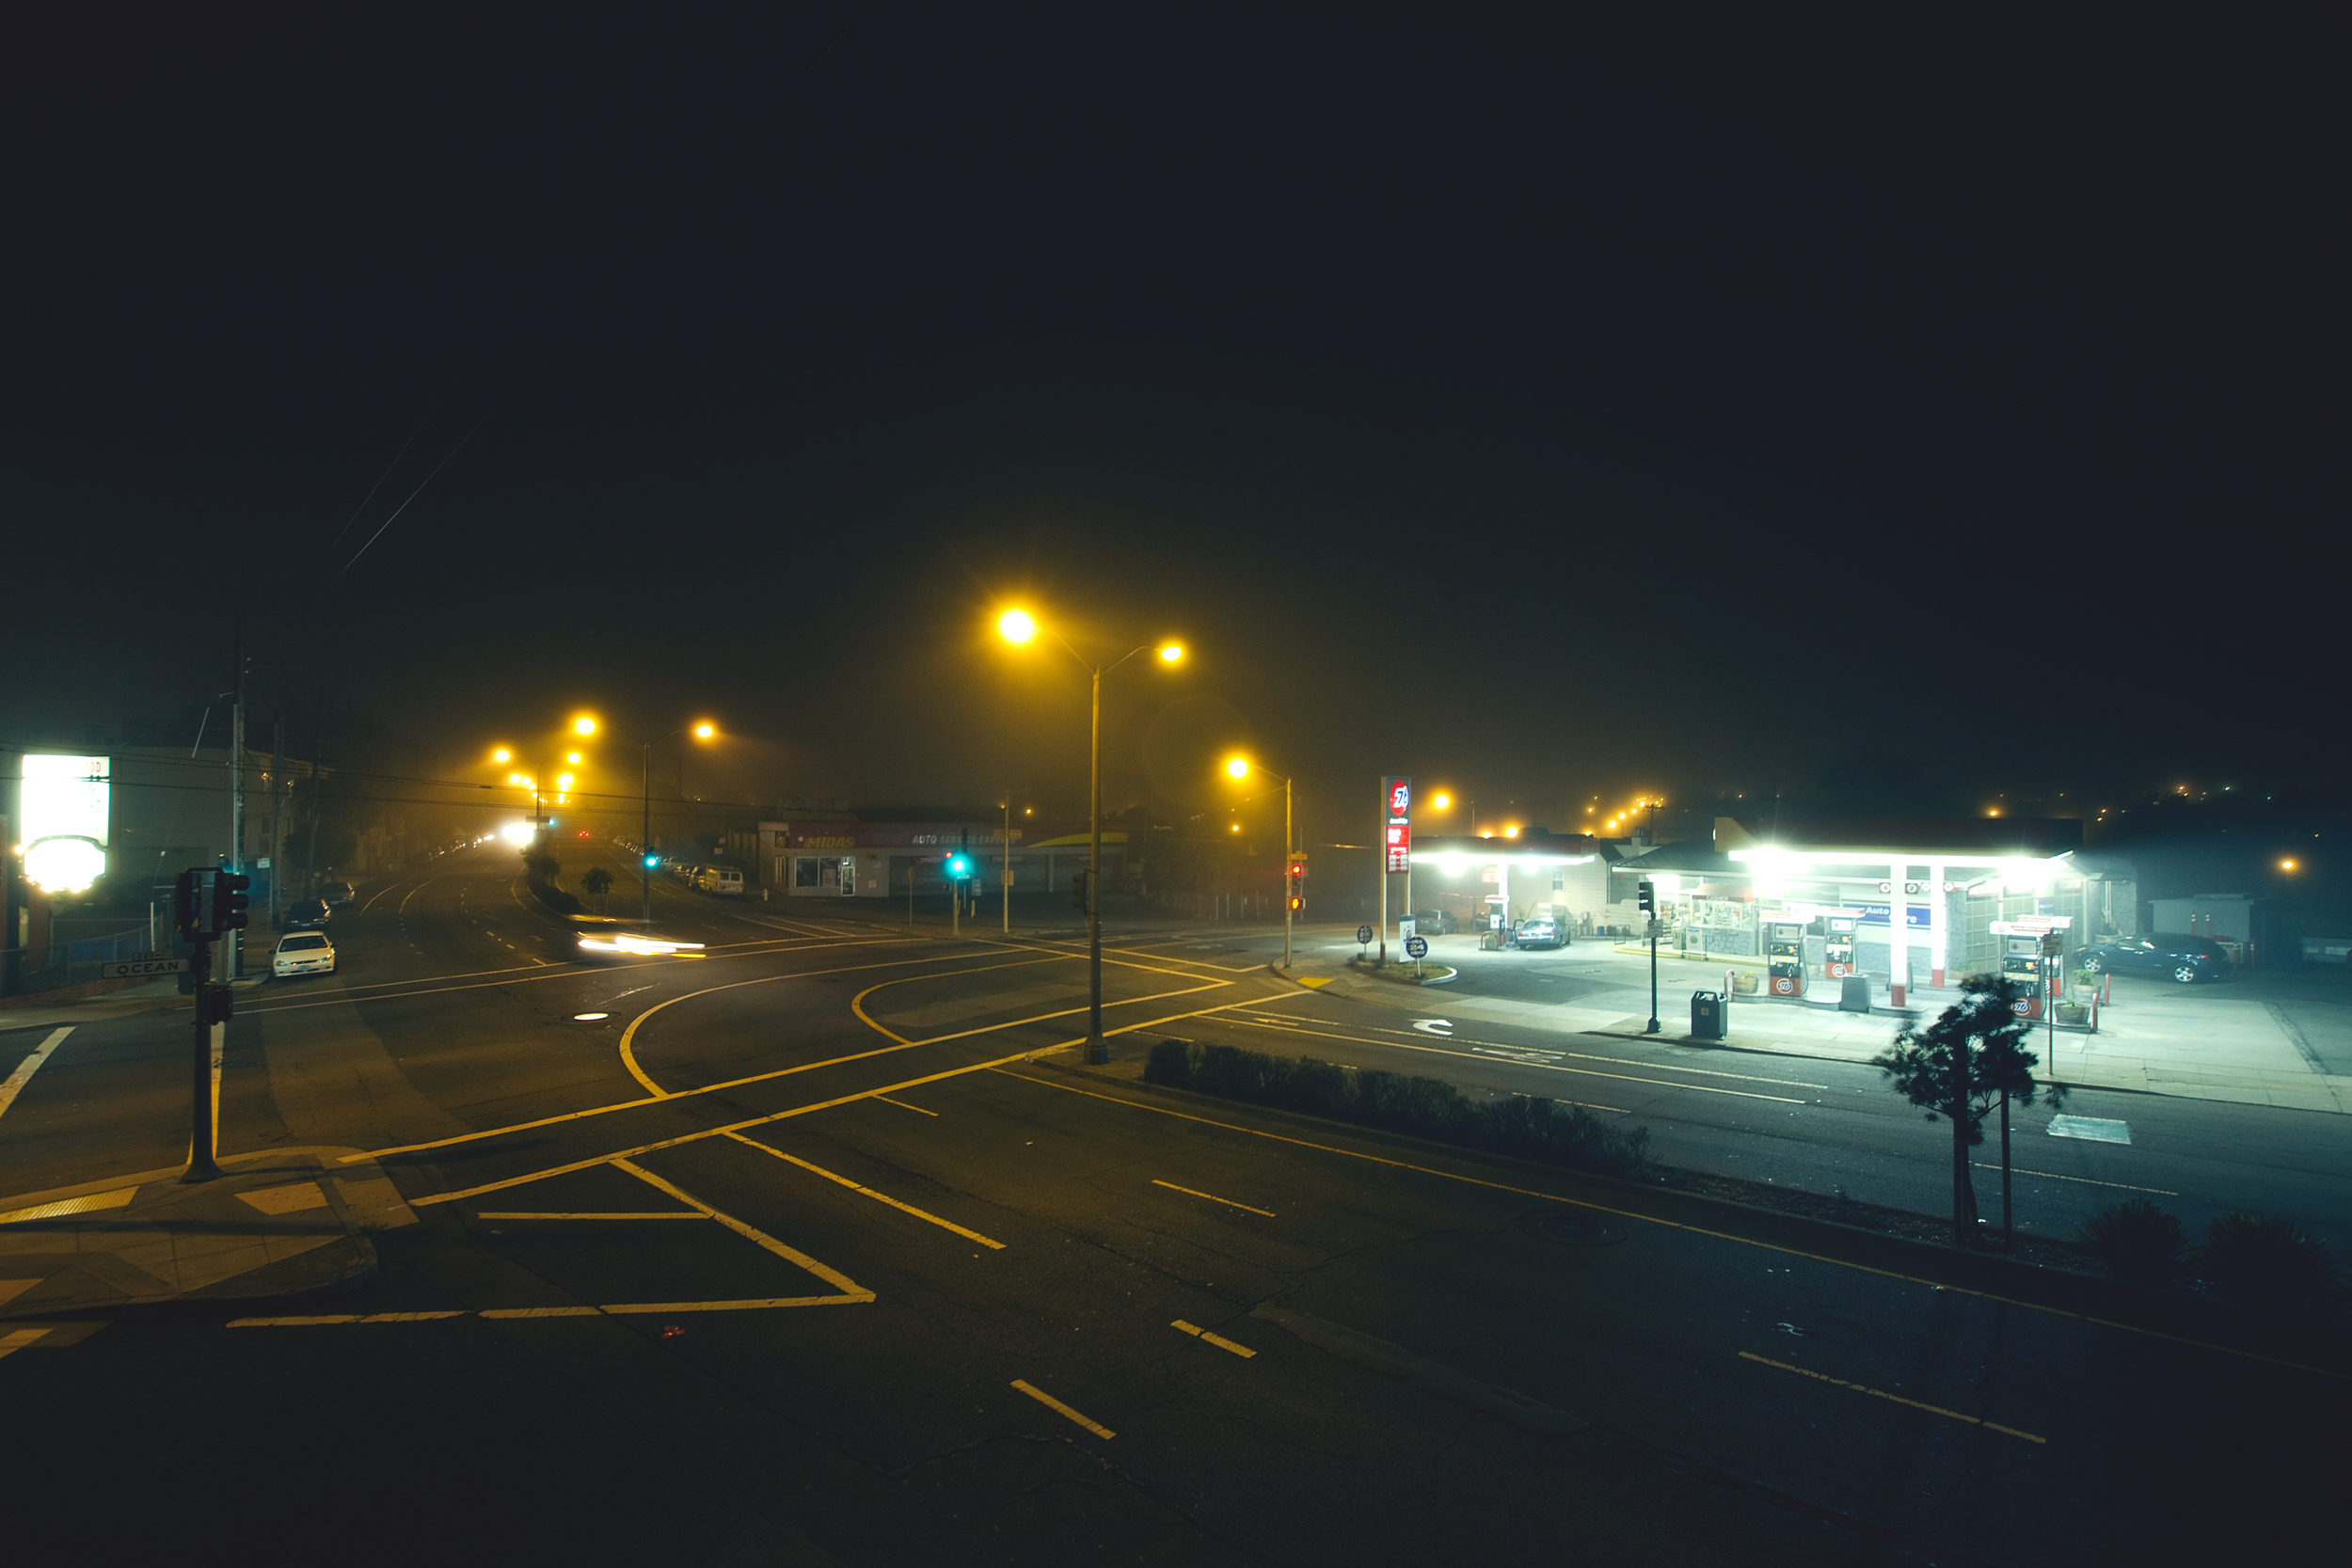 sf street07.jpg